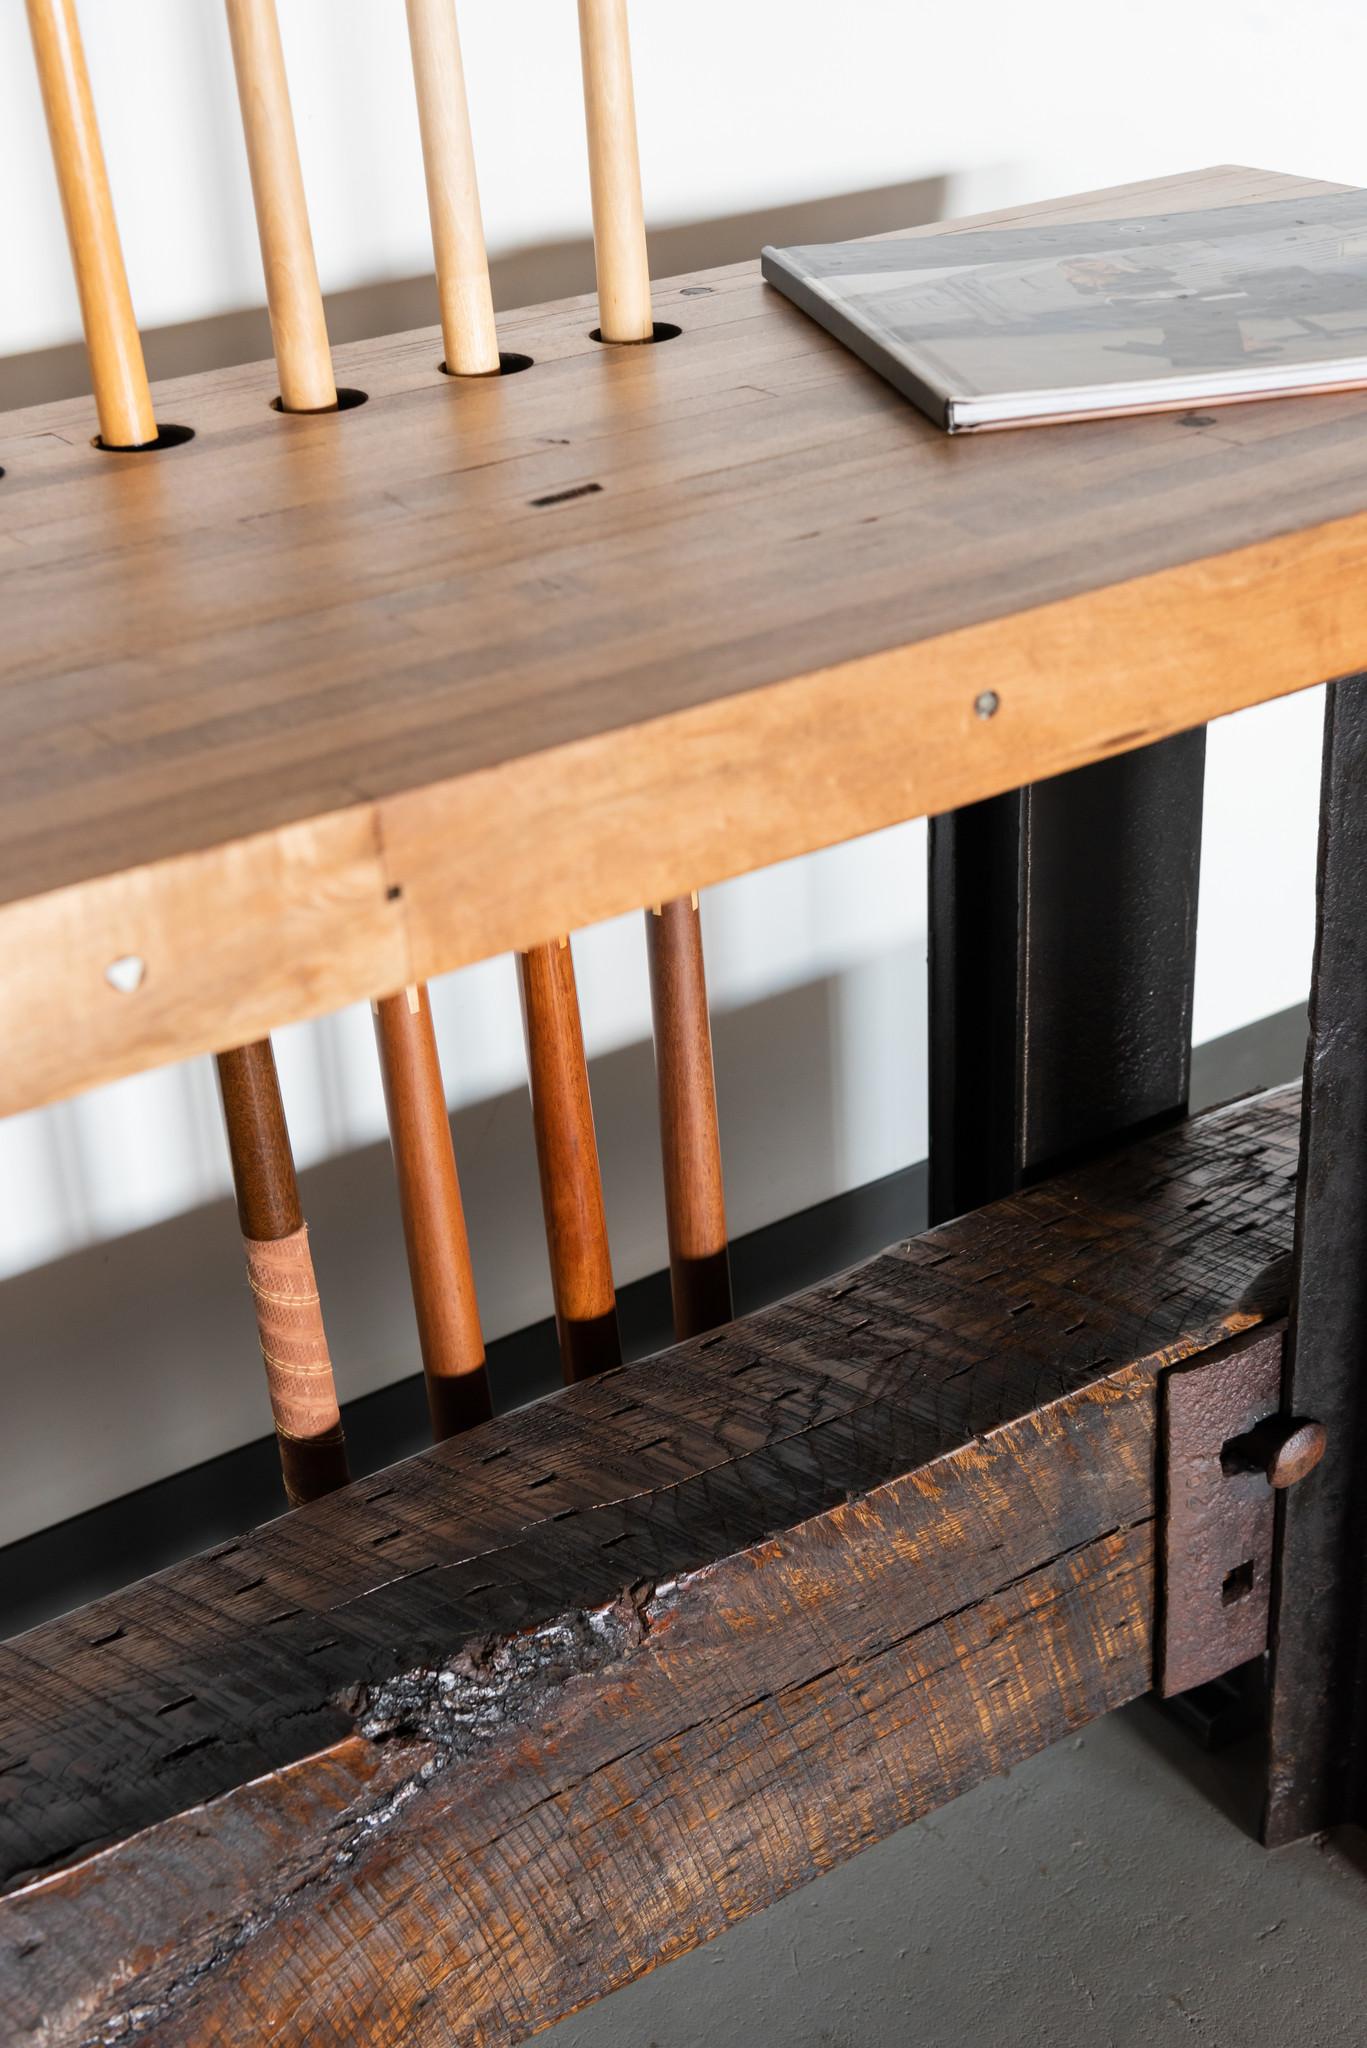 Interior designer heavy duty railroad style pool cue side table